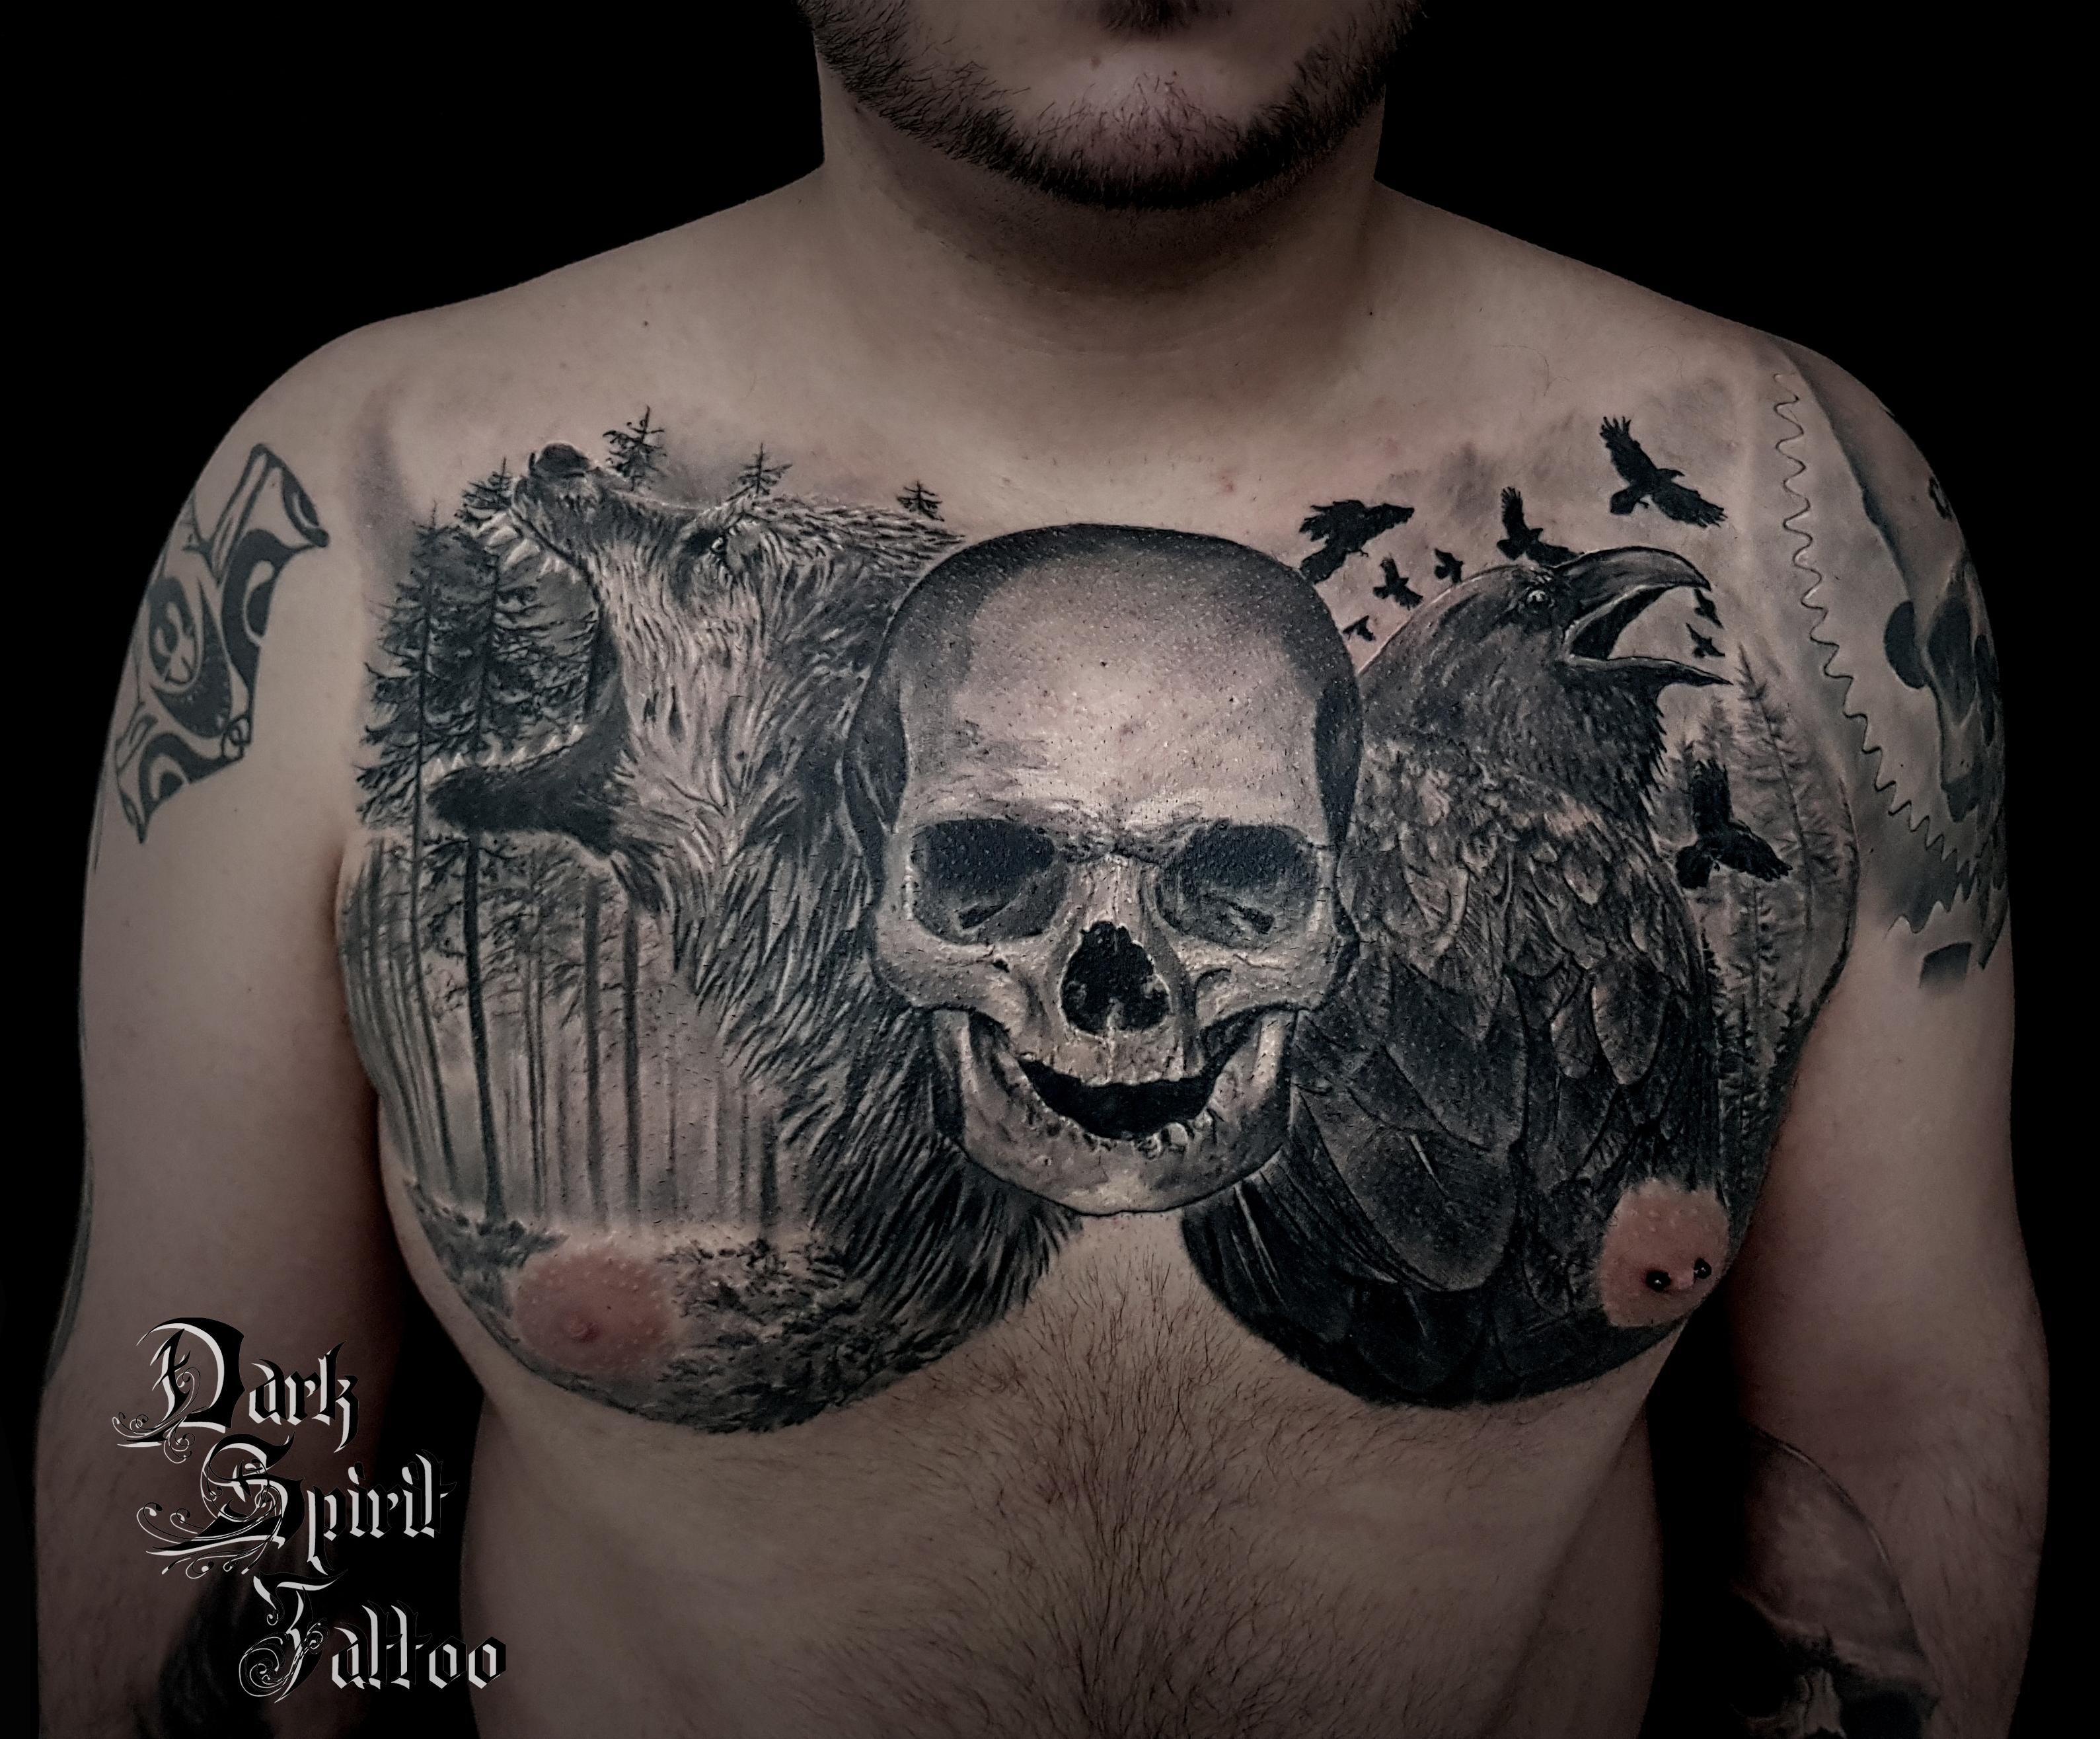 tatouage lagertha lodbrok dark spirit tattoo. Black Bedroom Furniture Sets. Home Design Ideas